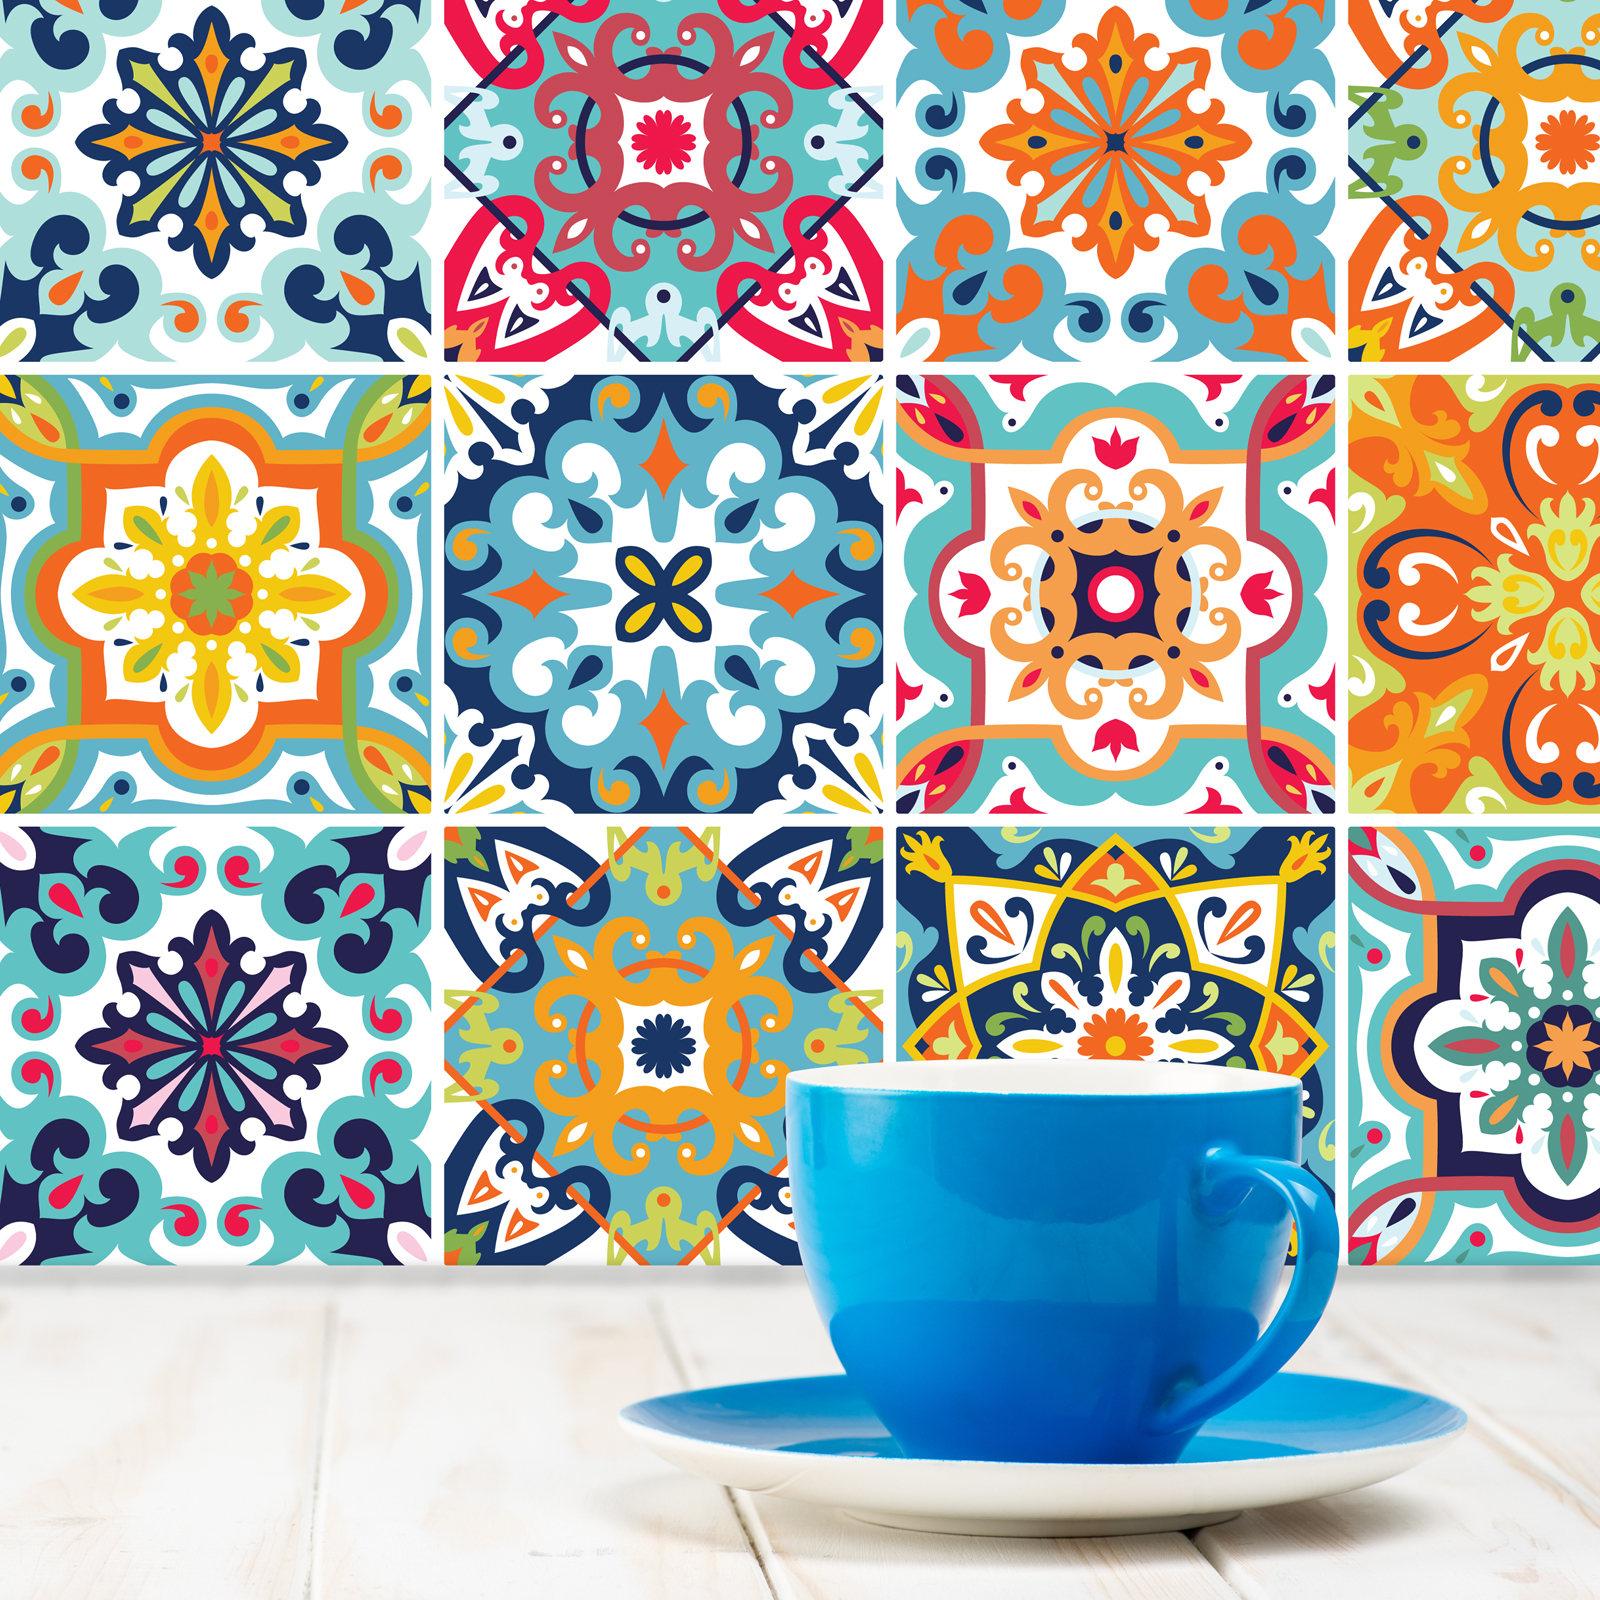 Mediterranean Portuguese Moroccan Style T7 Wall Genie